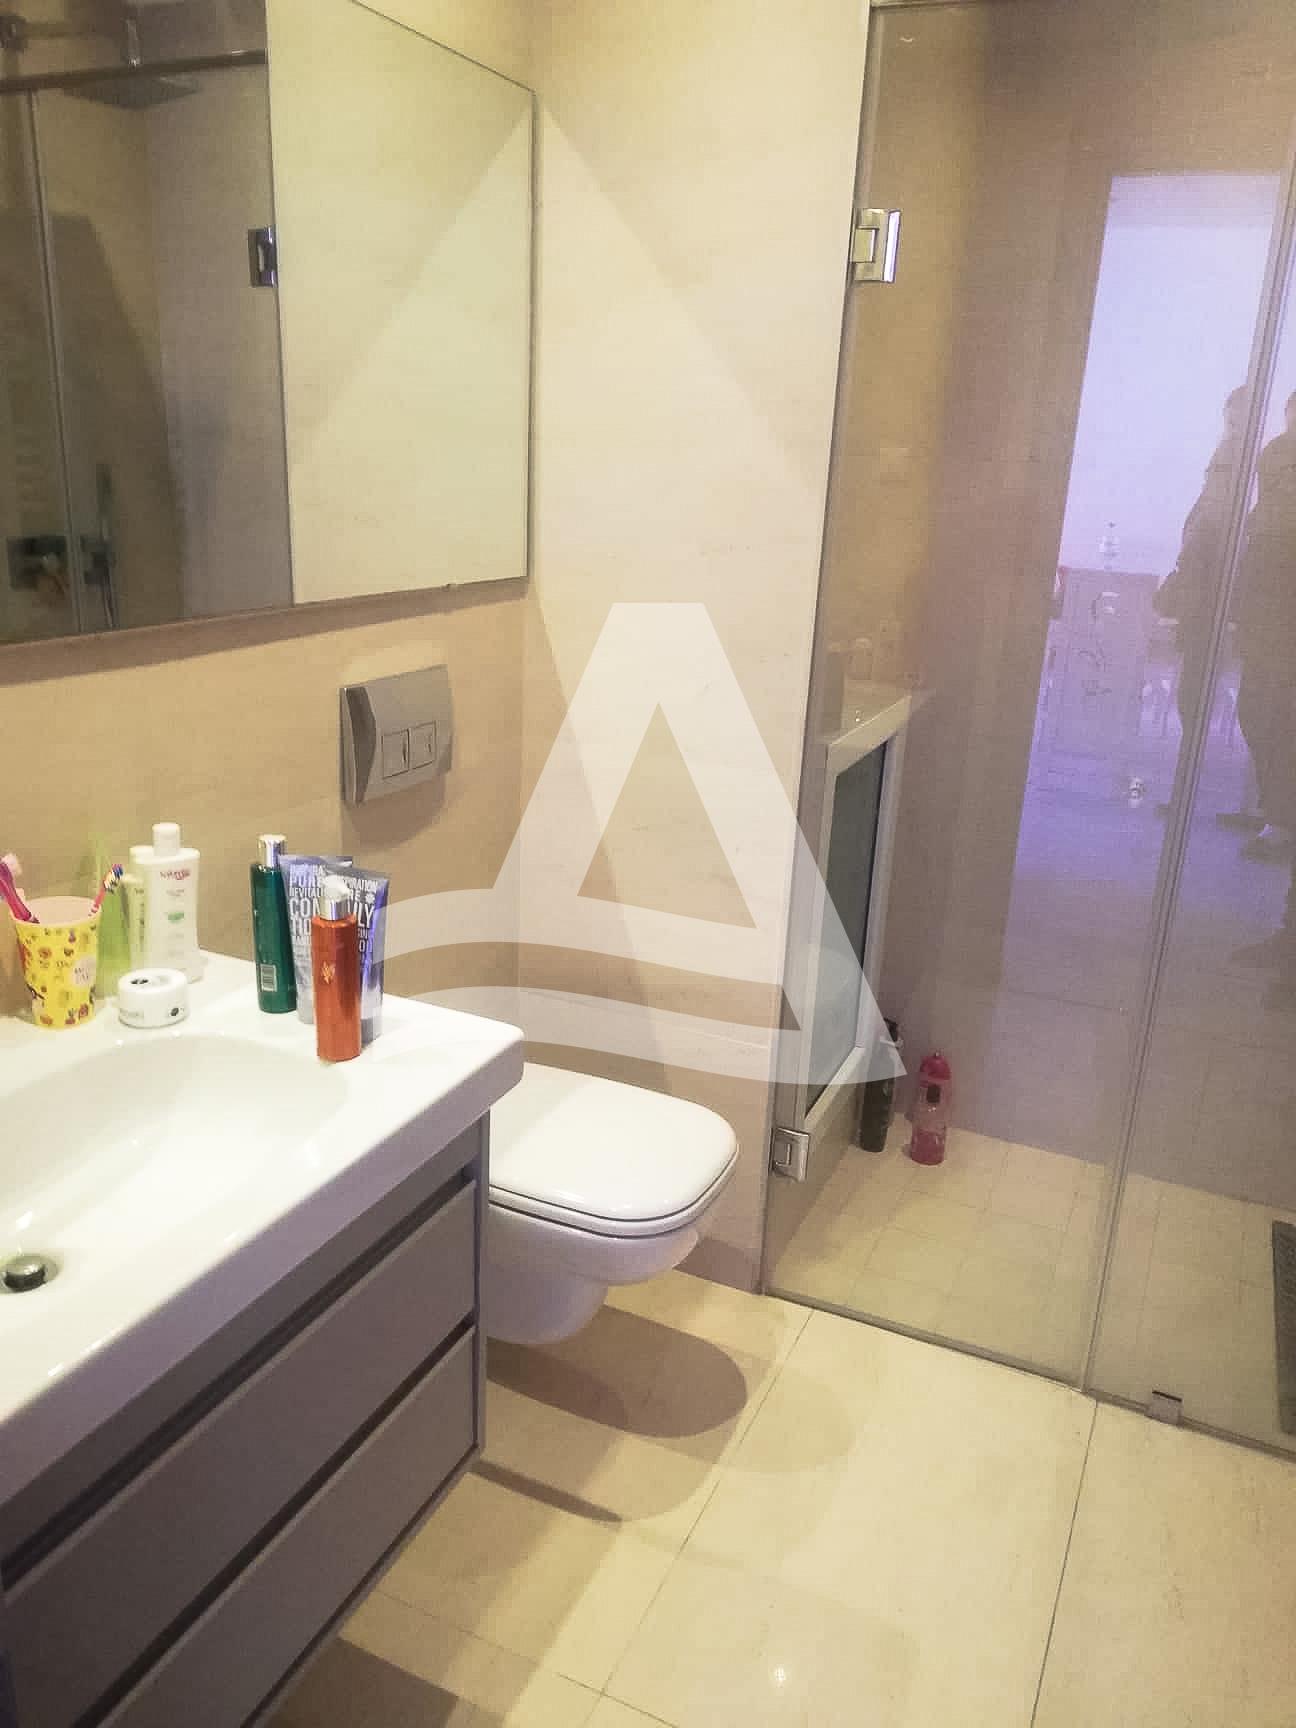 httpss3.amazonaws.comlogimoawsImmobilier_La_marsa_-_arcane_immobiliere-5_1554216056706